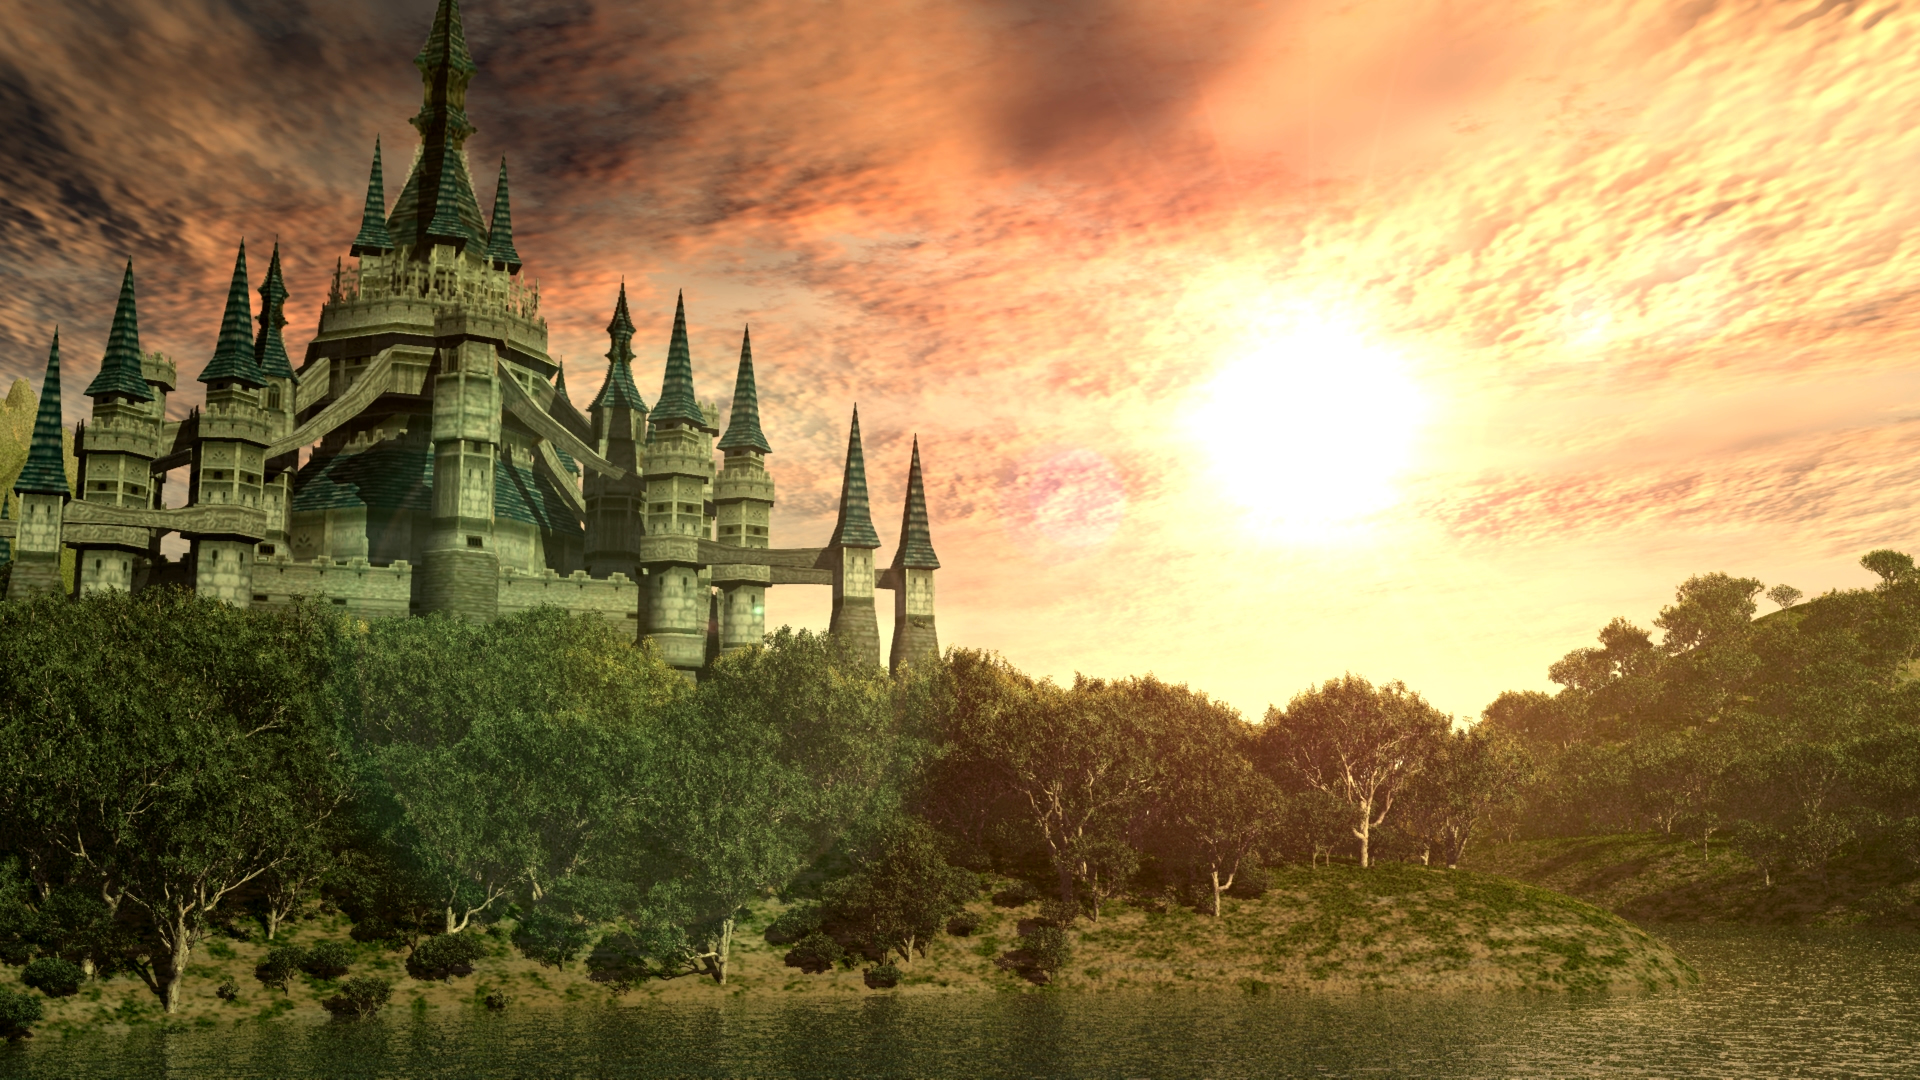 Hyrule Castle Twilight Princess wallpaper   210212 1920x1080